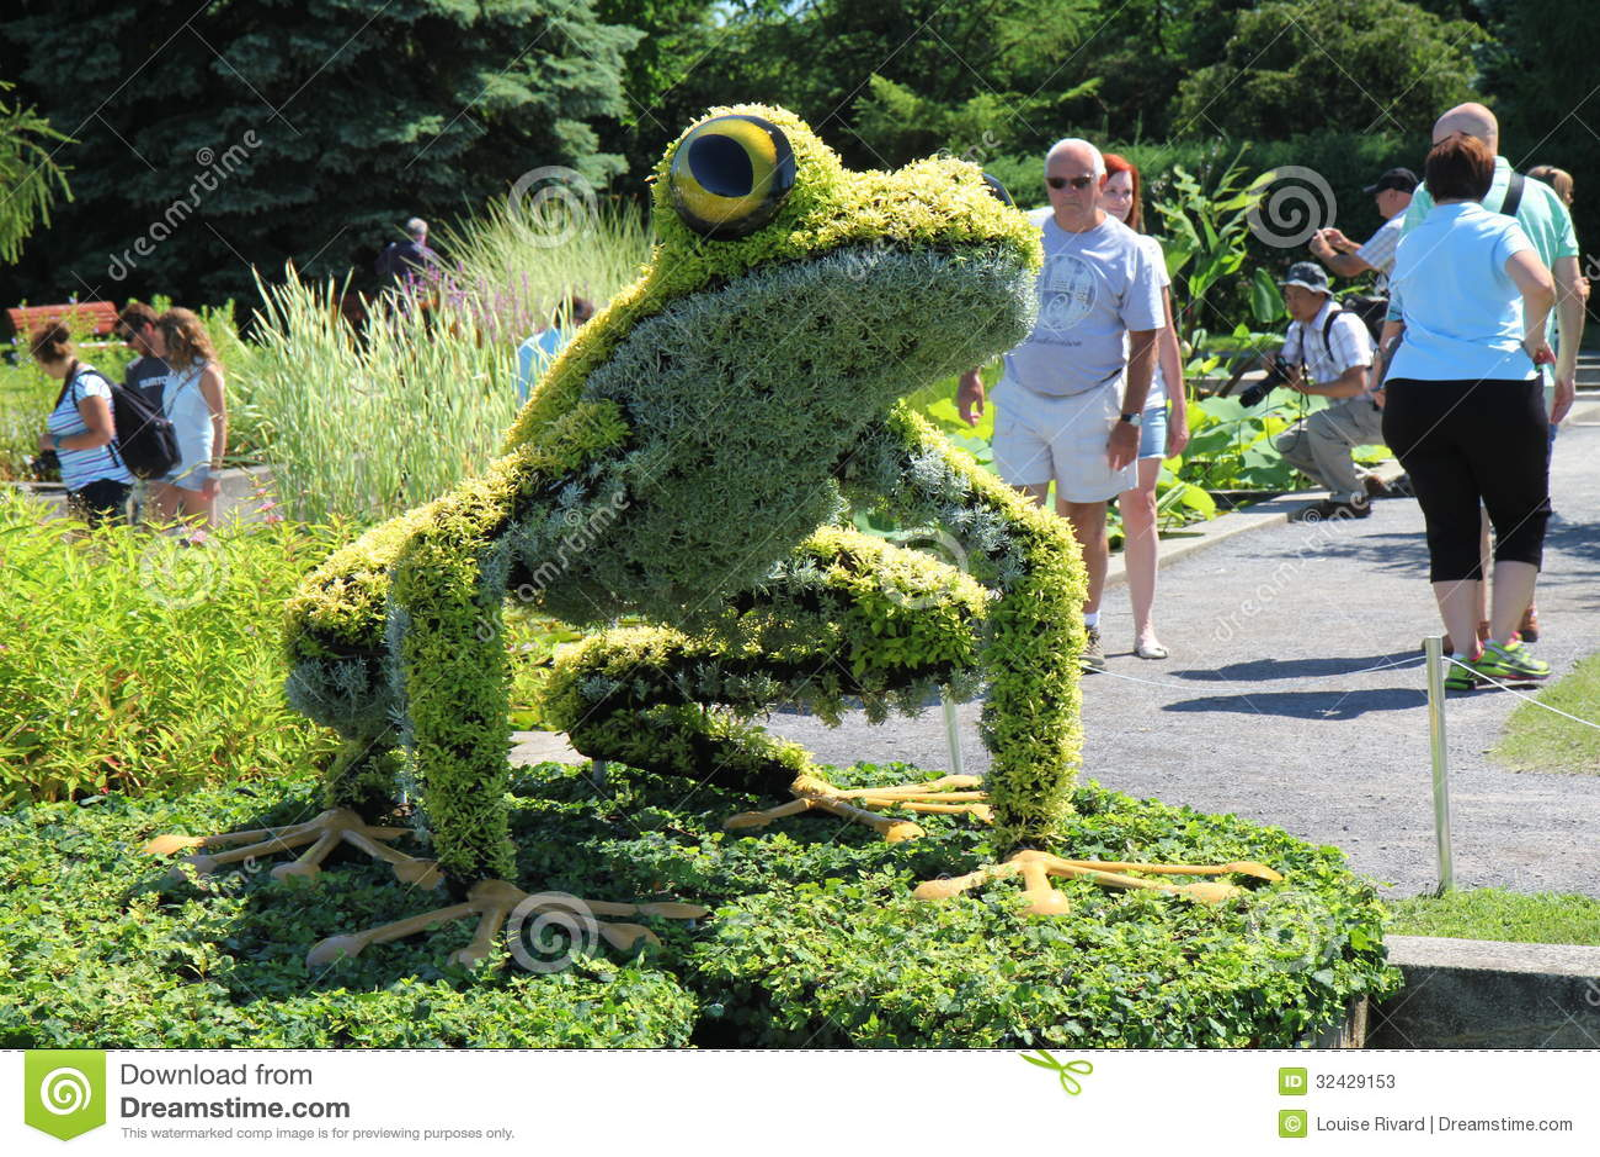 Botanical garden september 11 2017 indiscriminate act at m 10